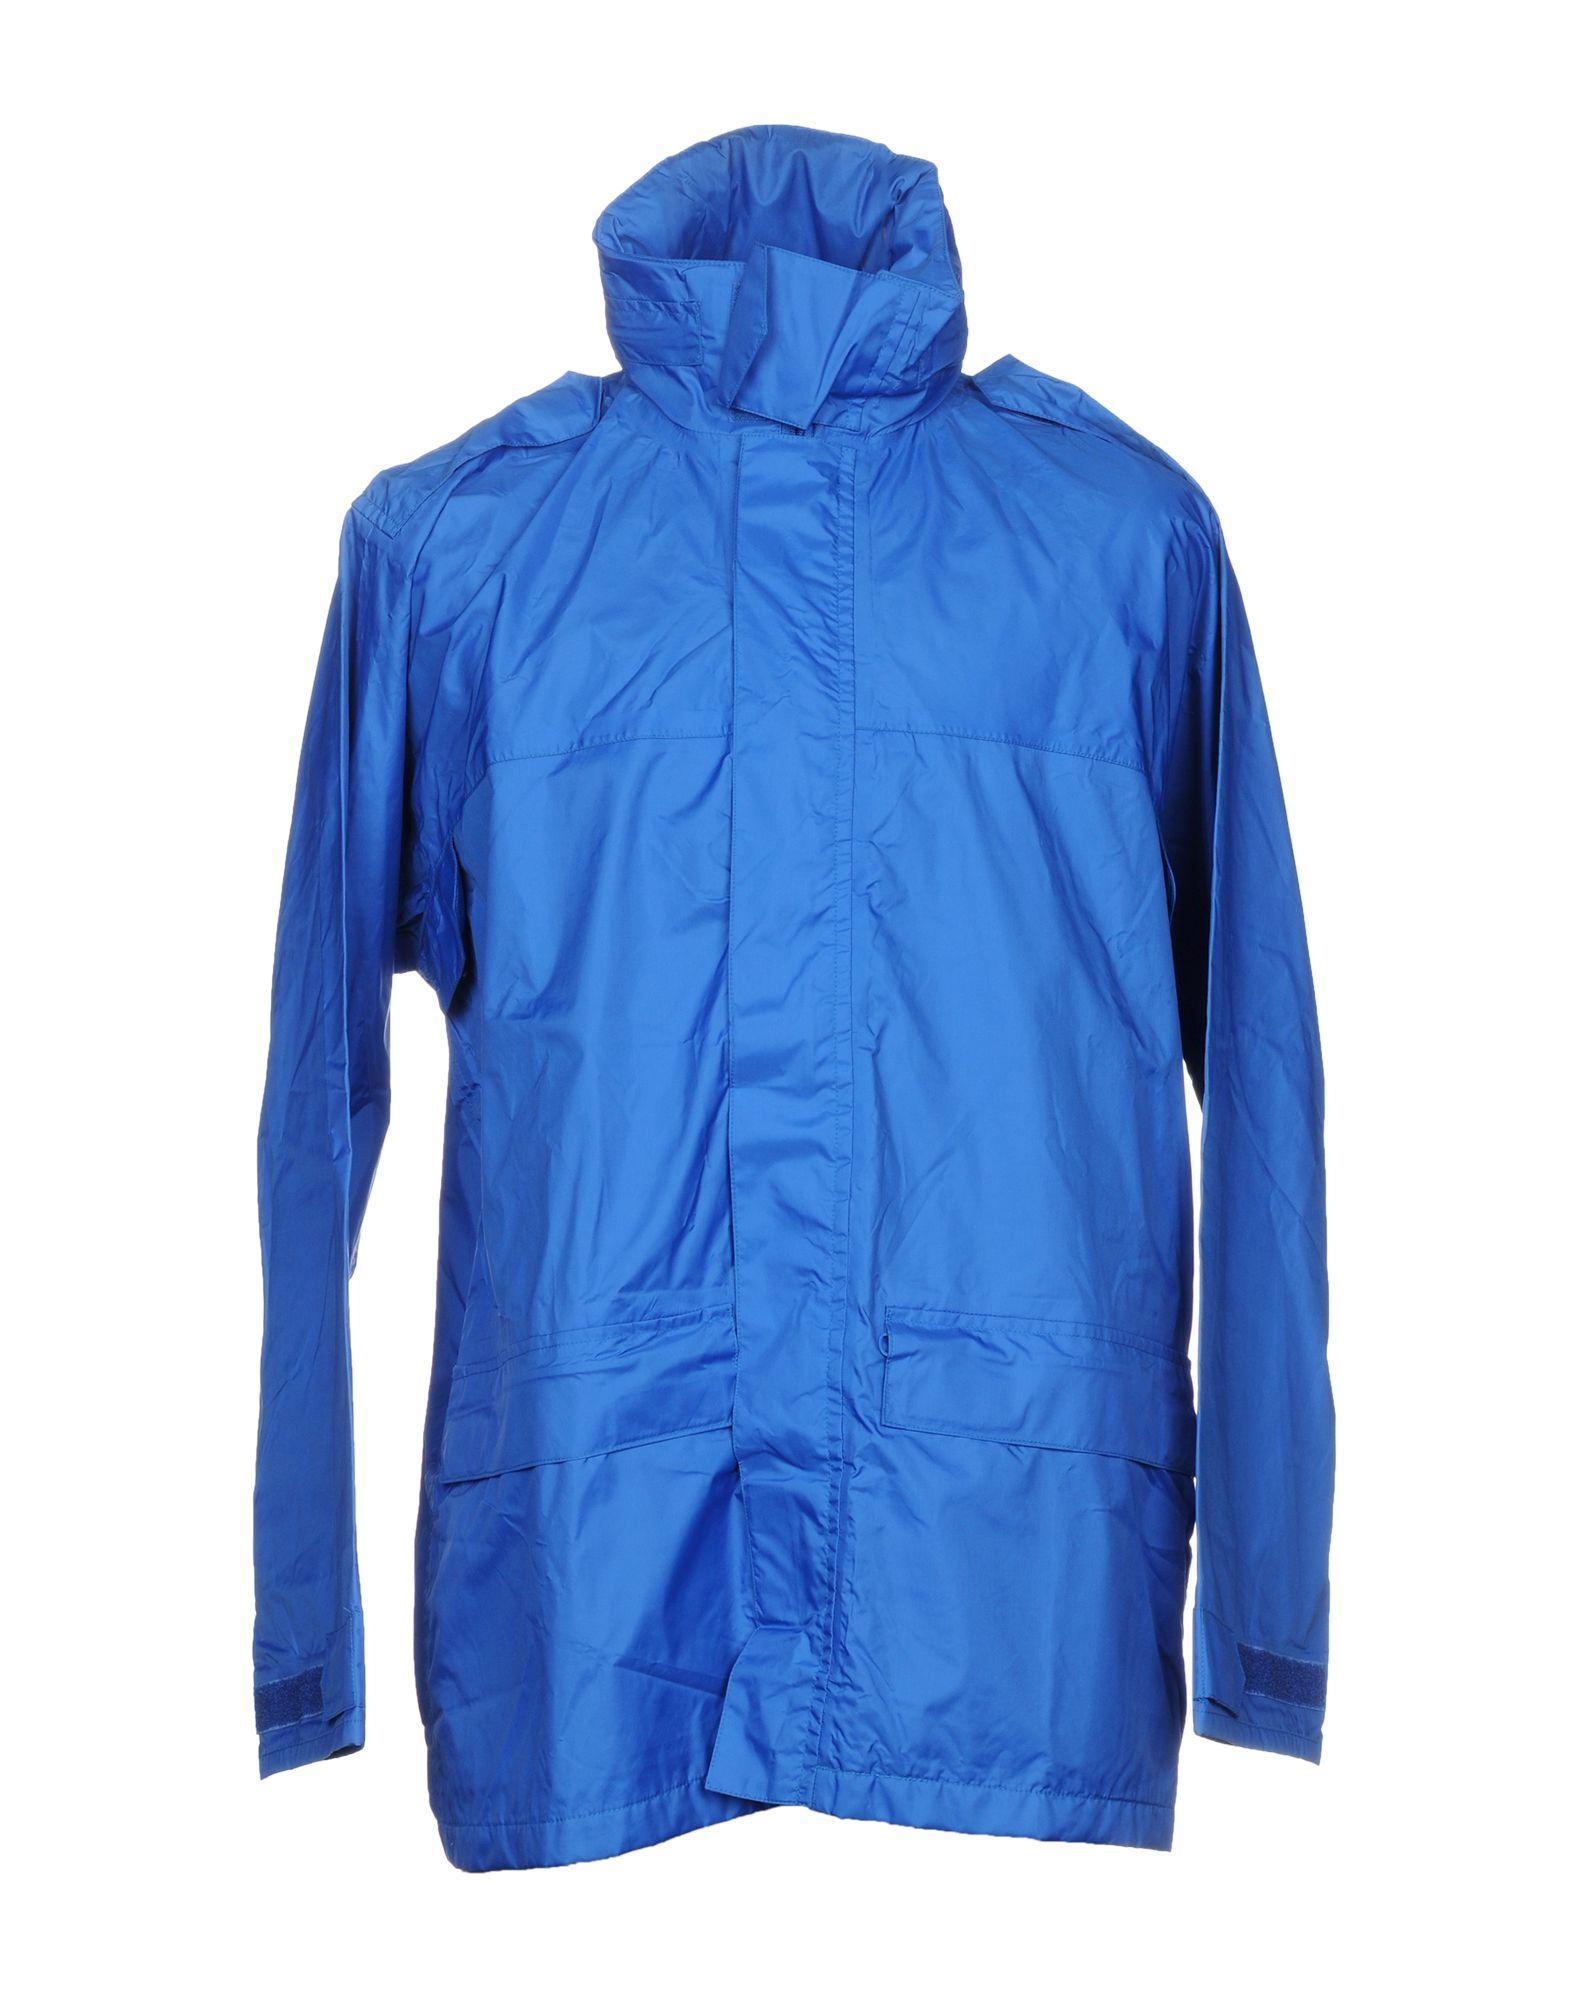 Aspesi Jacket In Azure